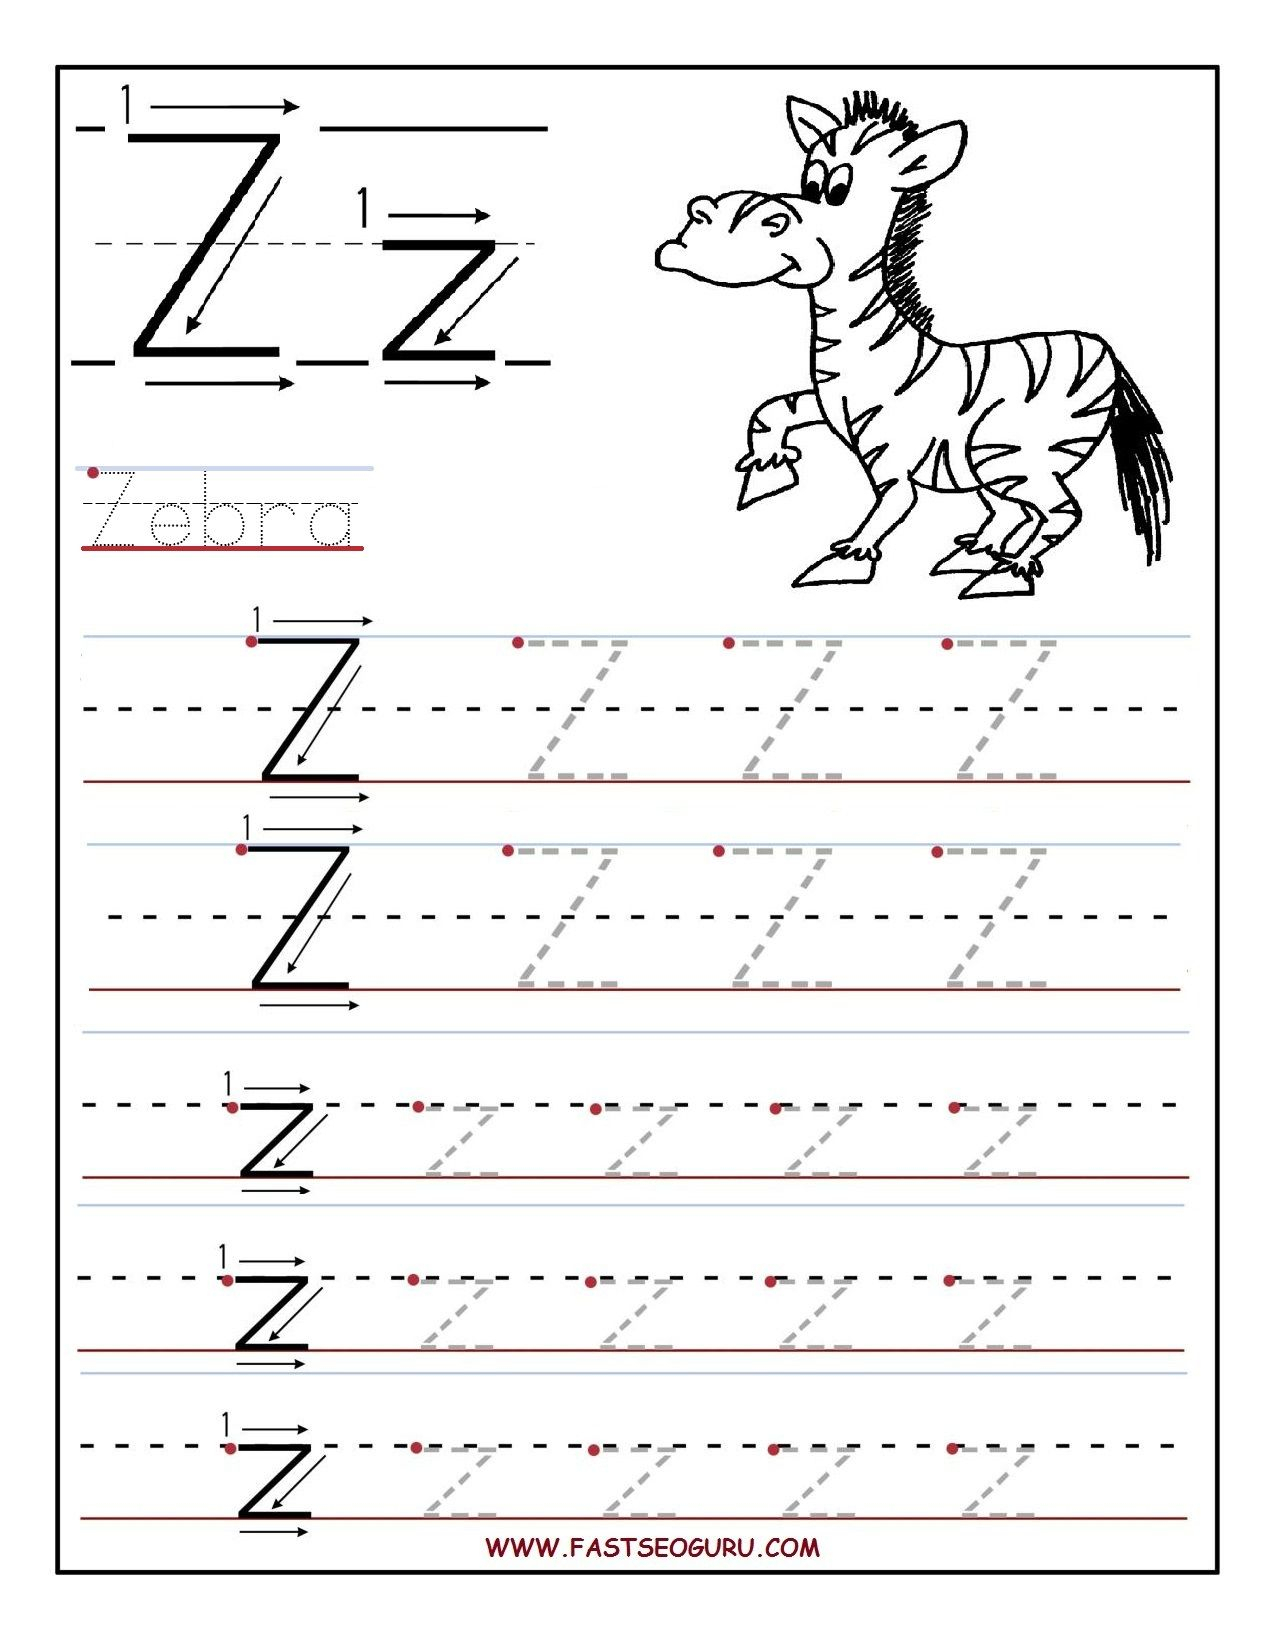 Printable Letter Z Tracing Worksheets For Preschool (With within Letter Z Worksheets Free Printable